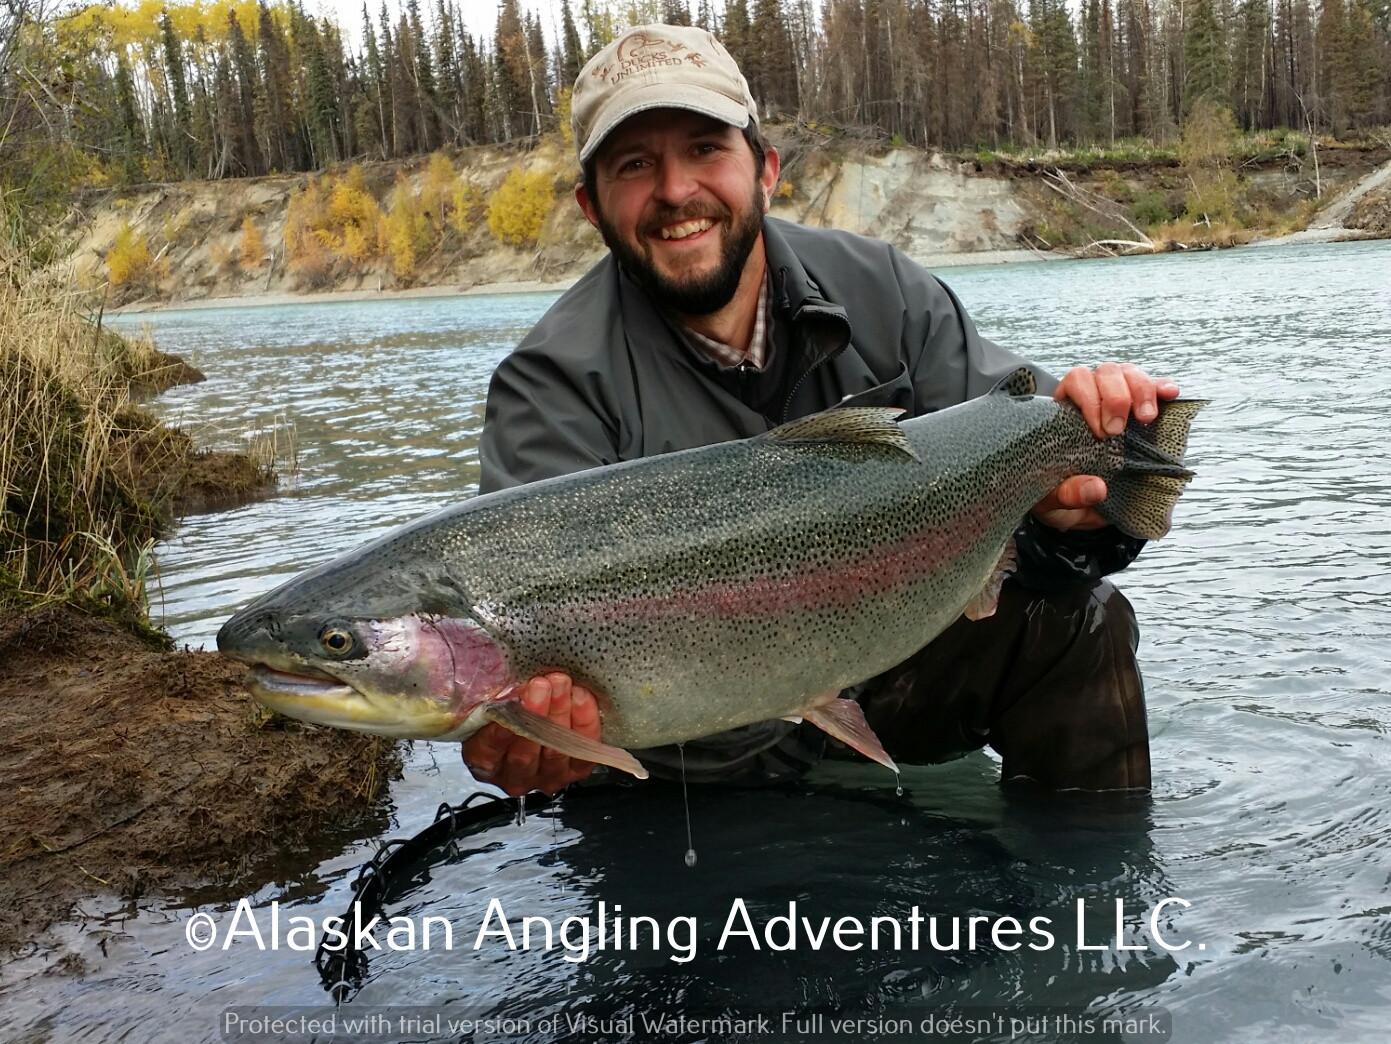 Alaskan Angling Adventures Llc.: Full Day Middle Kenai RiverFishing Trip